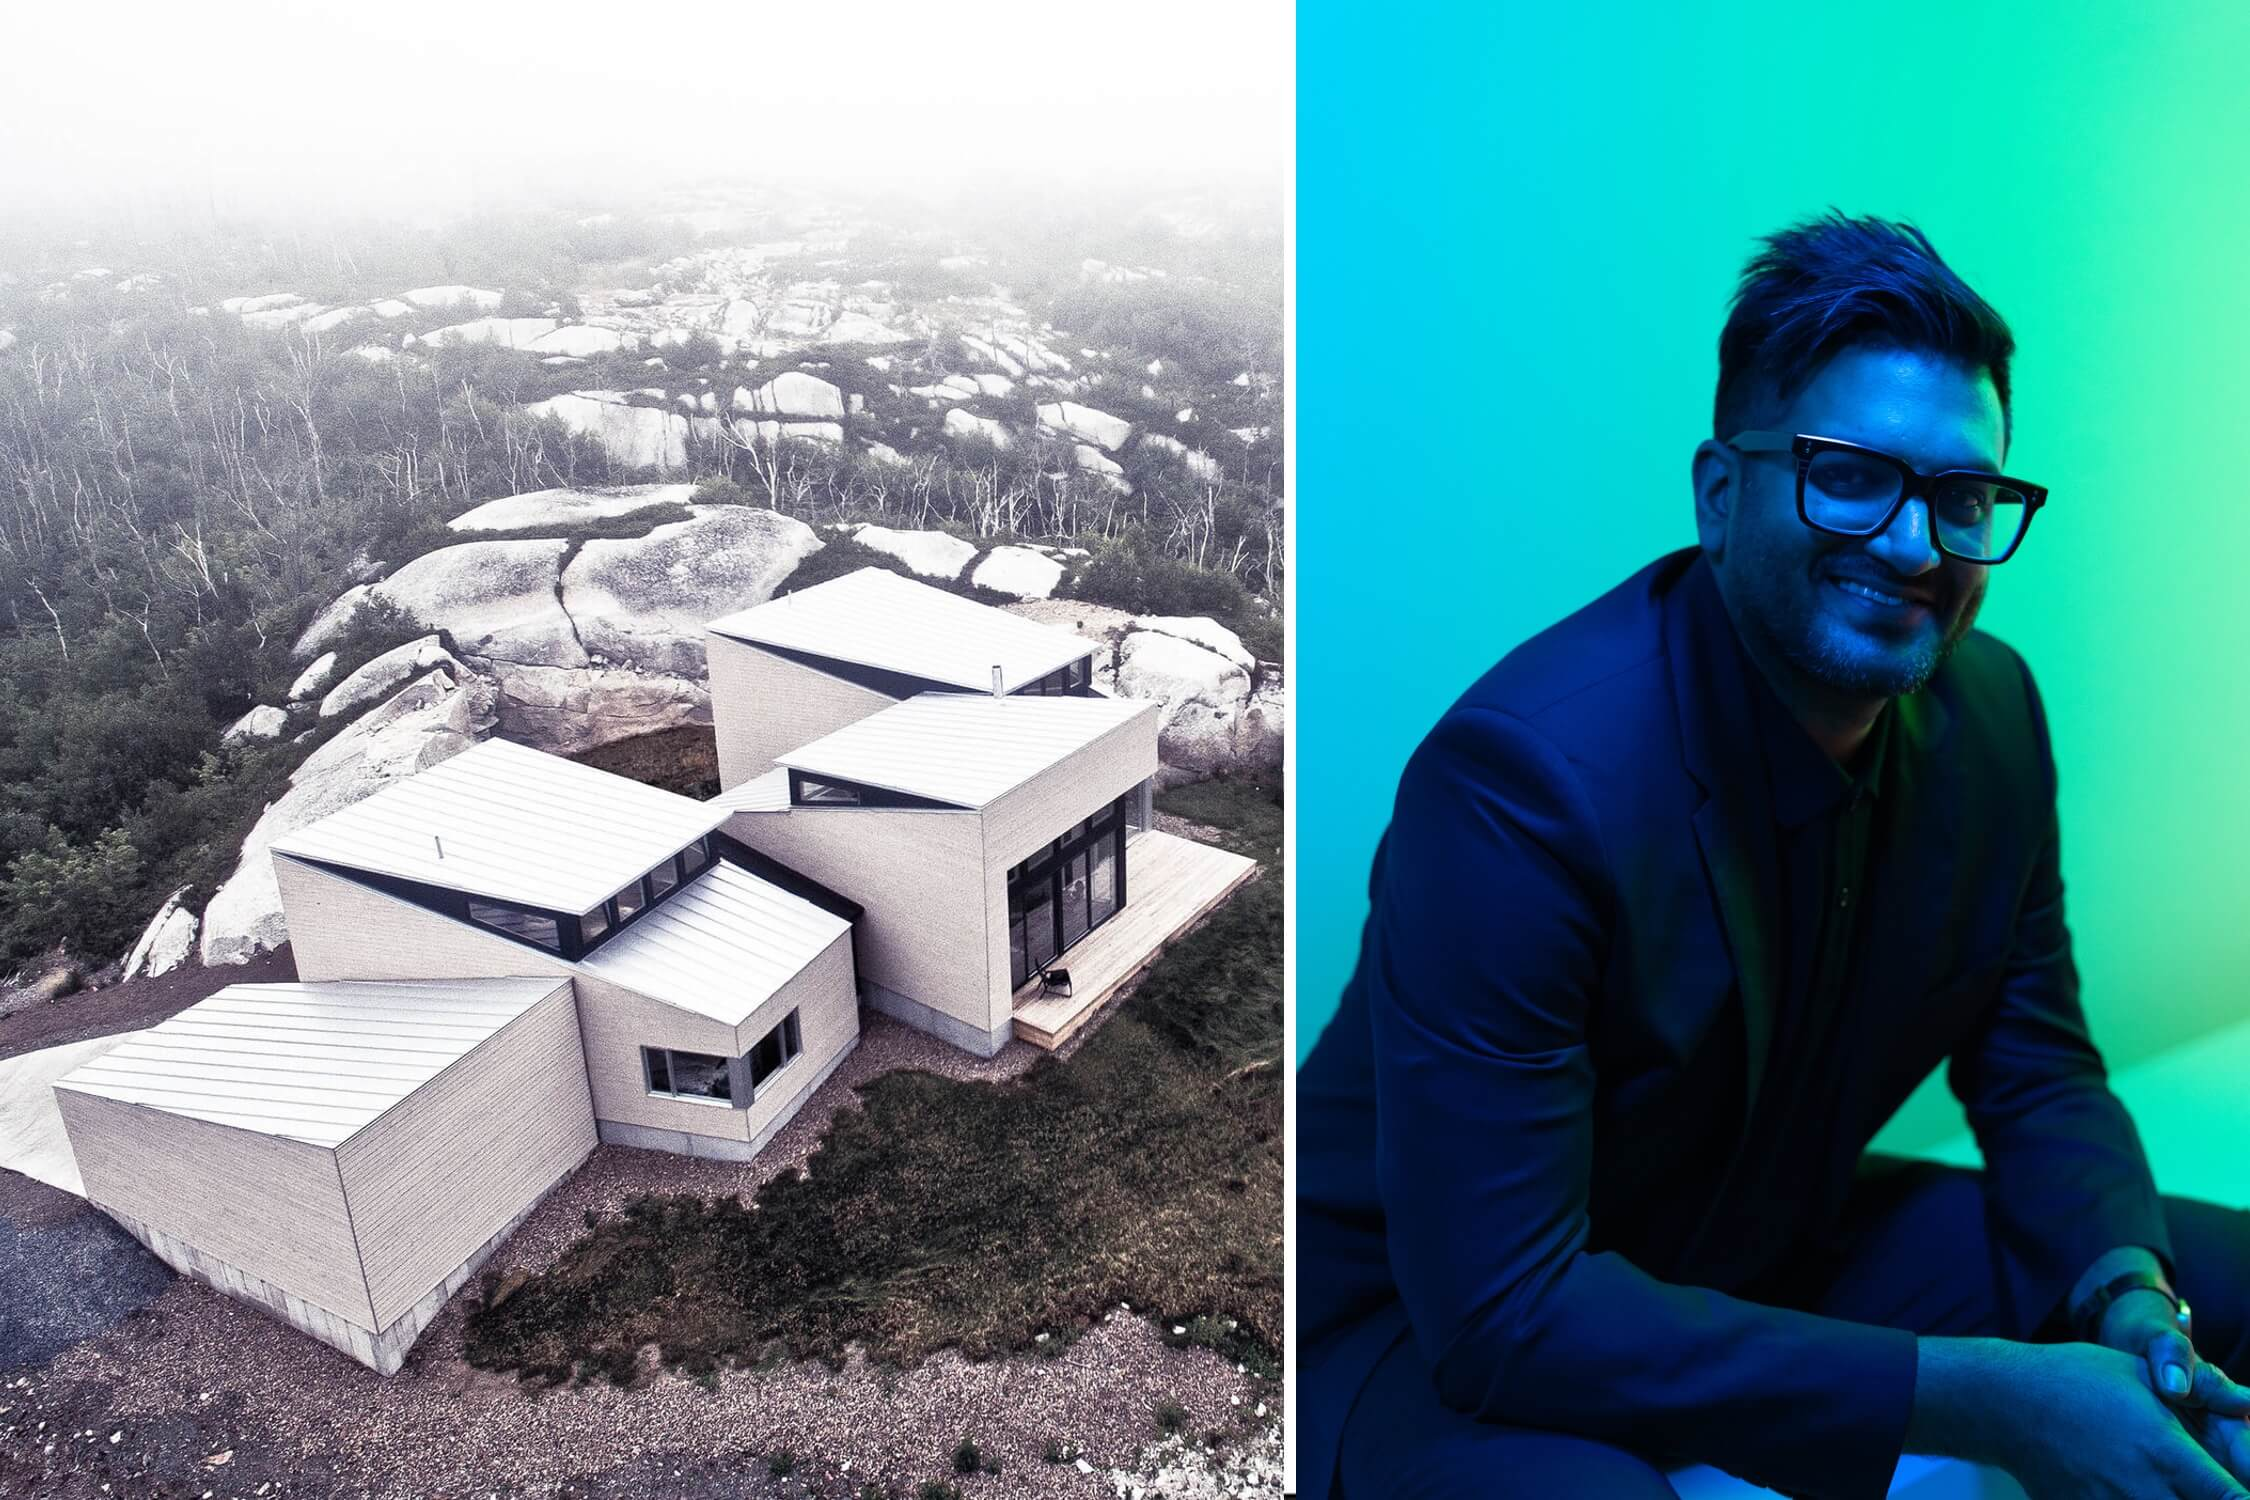 Omar Gandhi and his Float house in Halifax, Nova Scotia, AZ Awards 2020